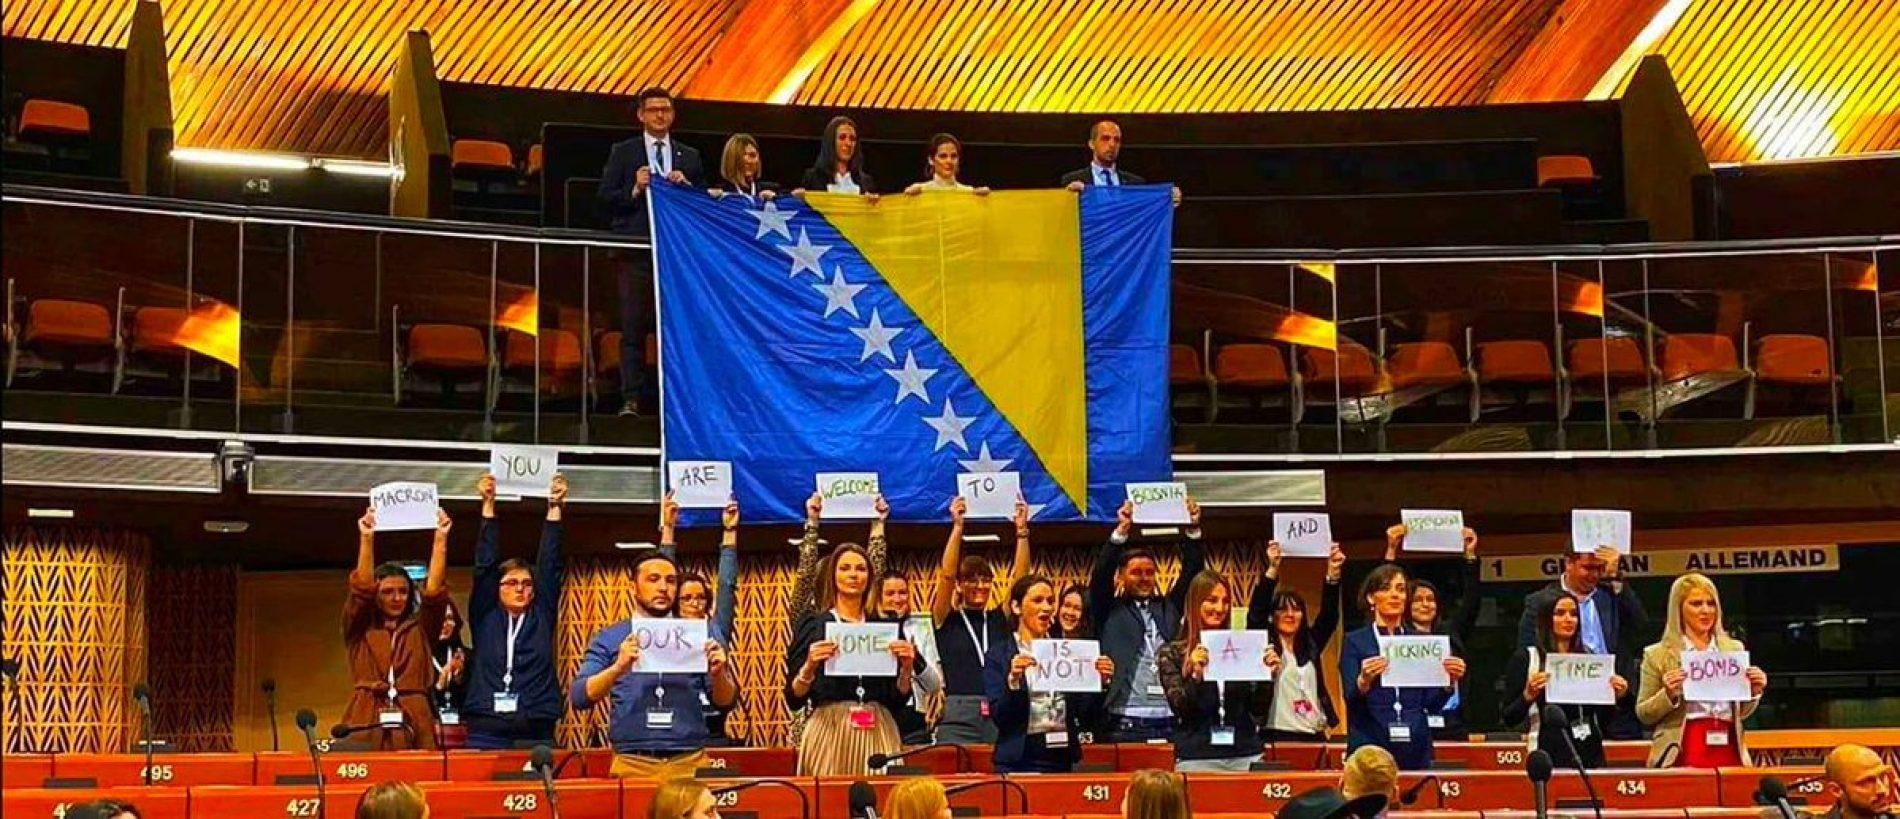 Mladi Bosanci u Strasbourgu poslali poruku Macronu